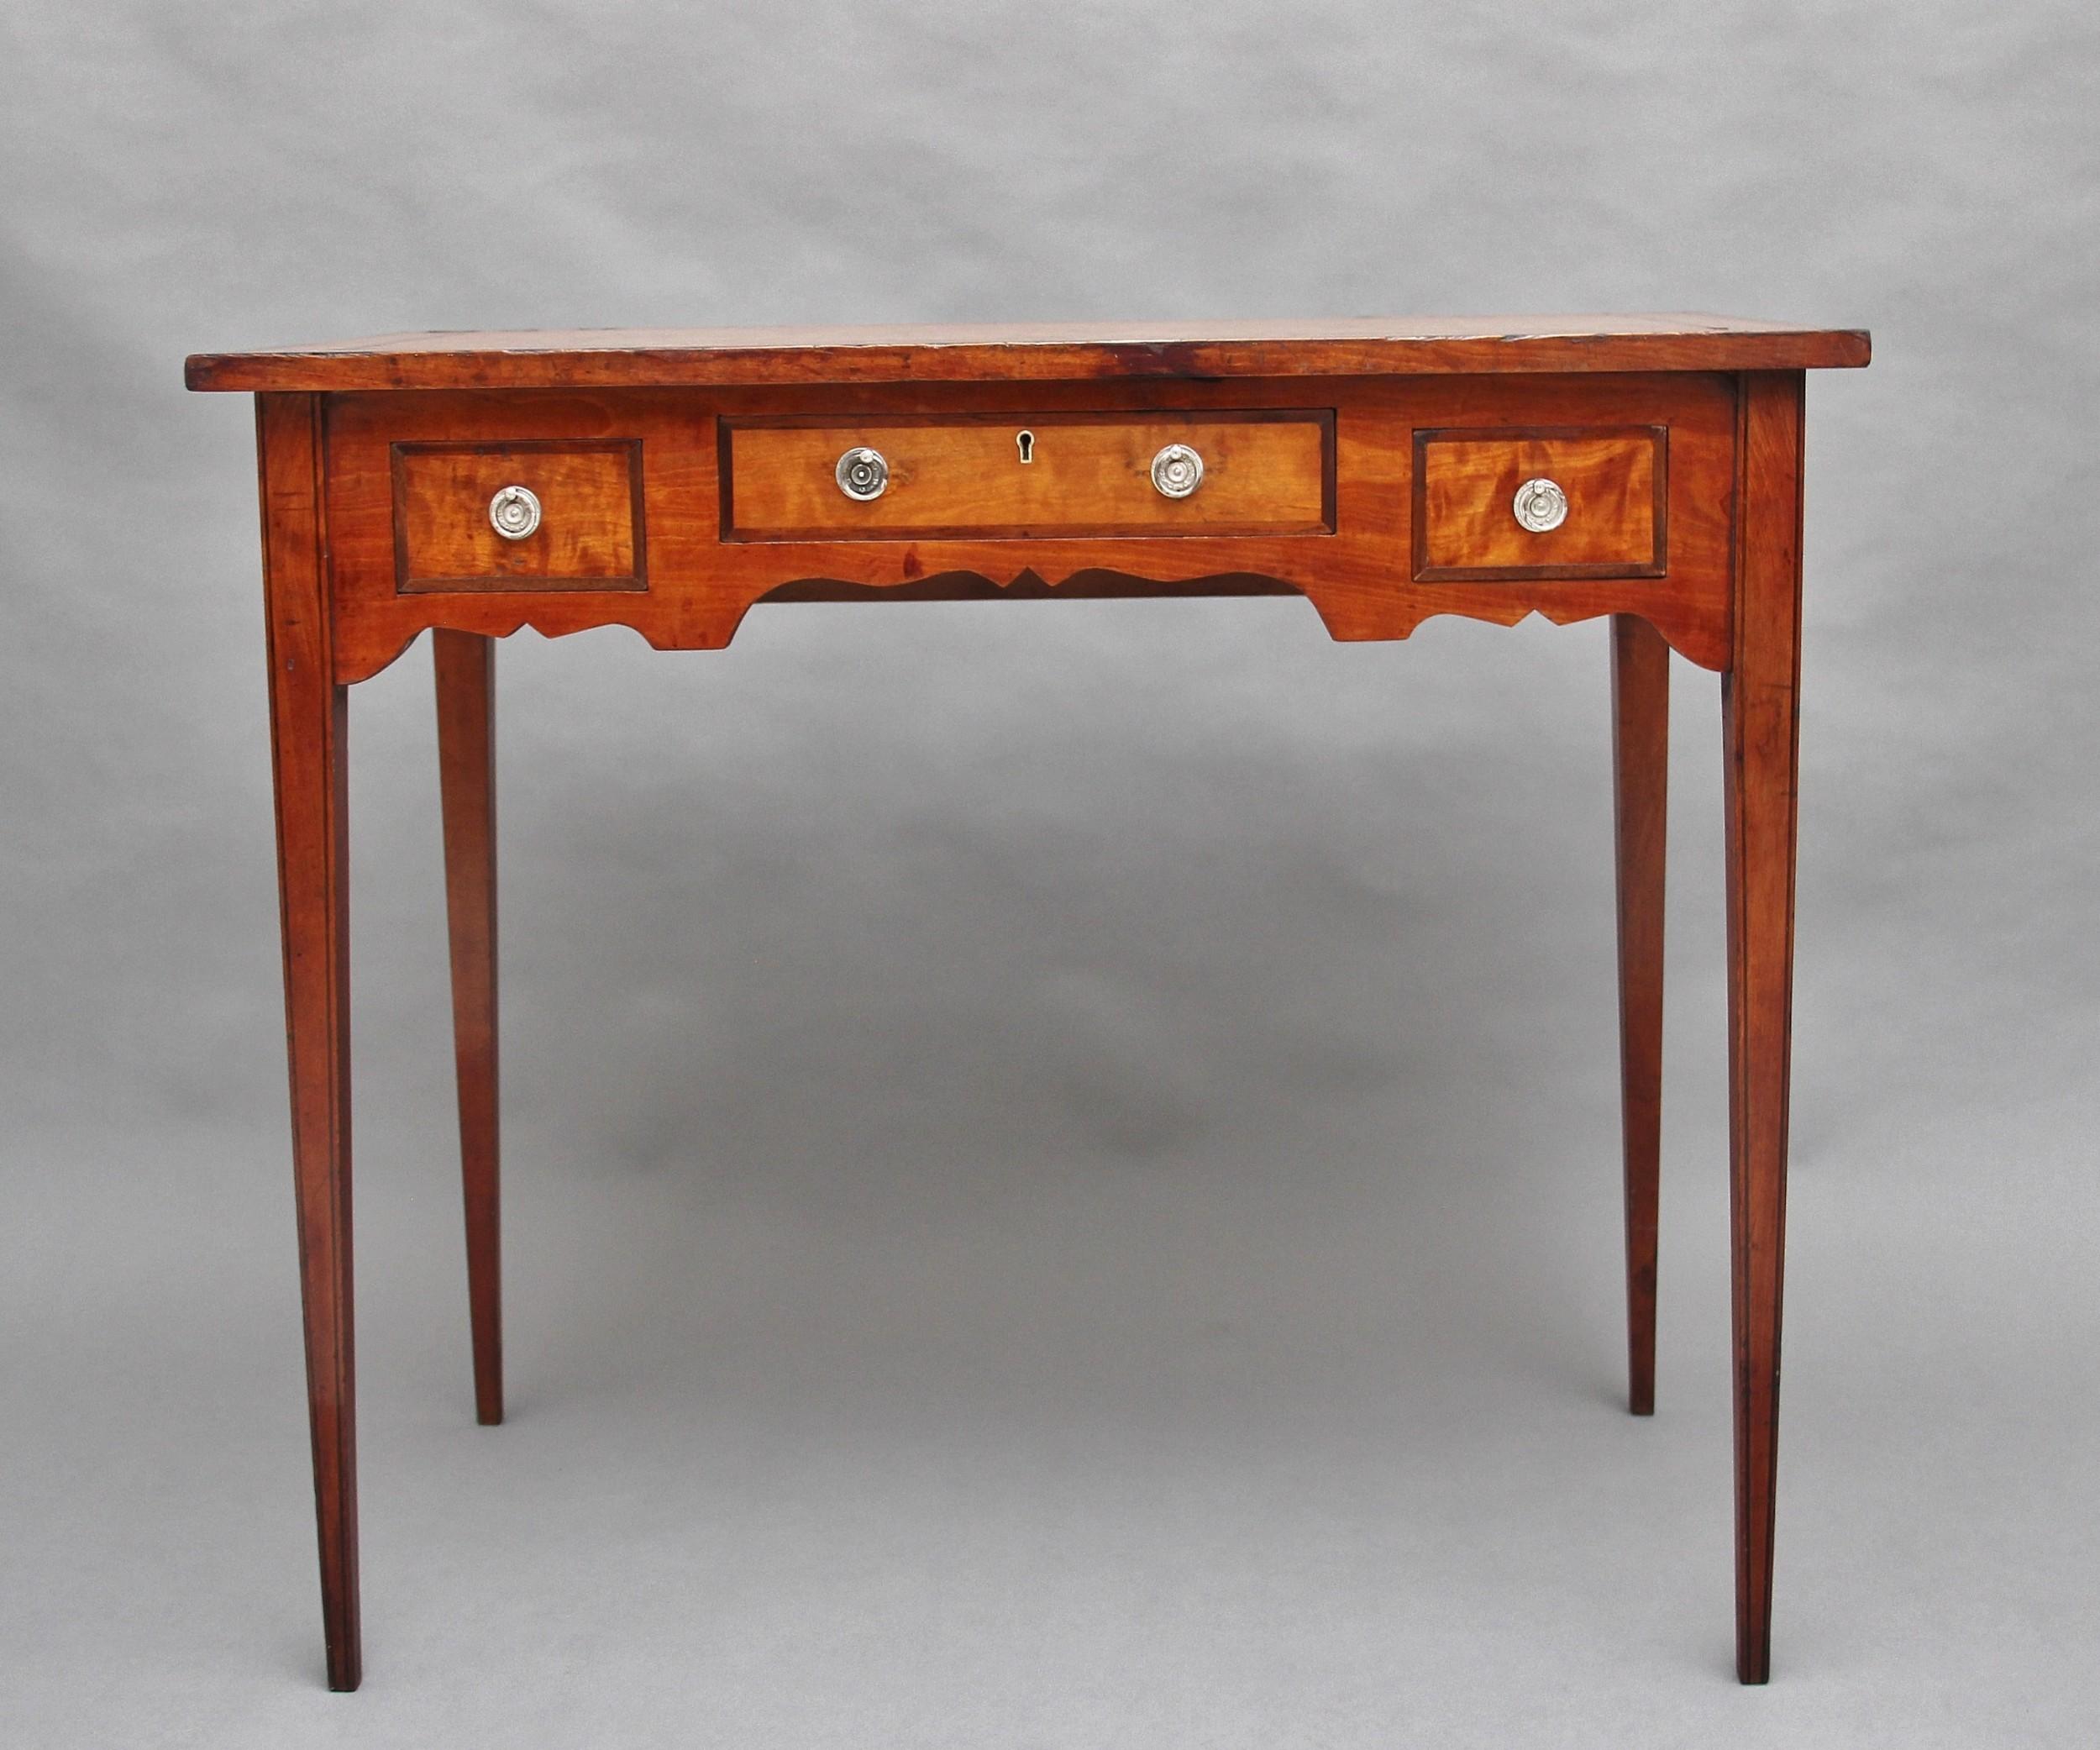 19th century satin birch side table